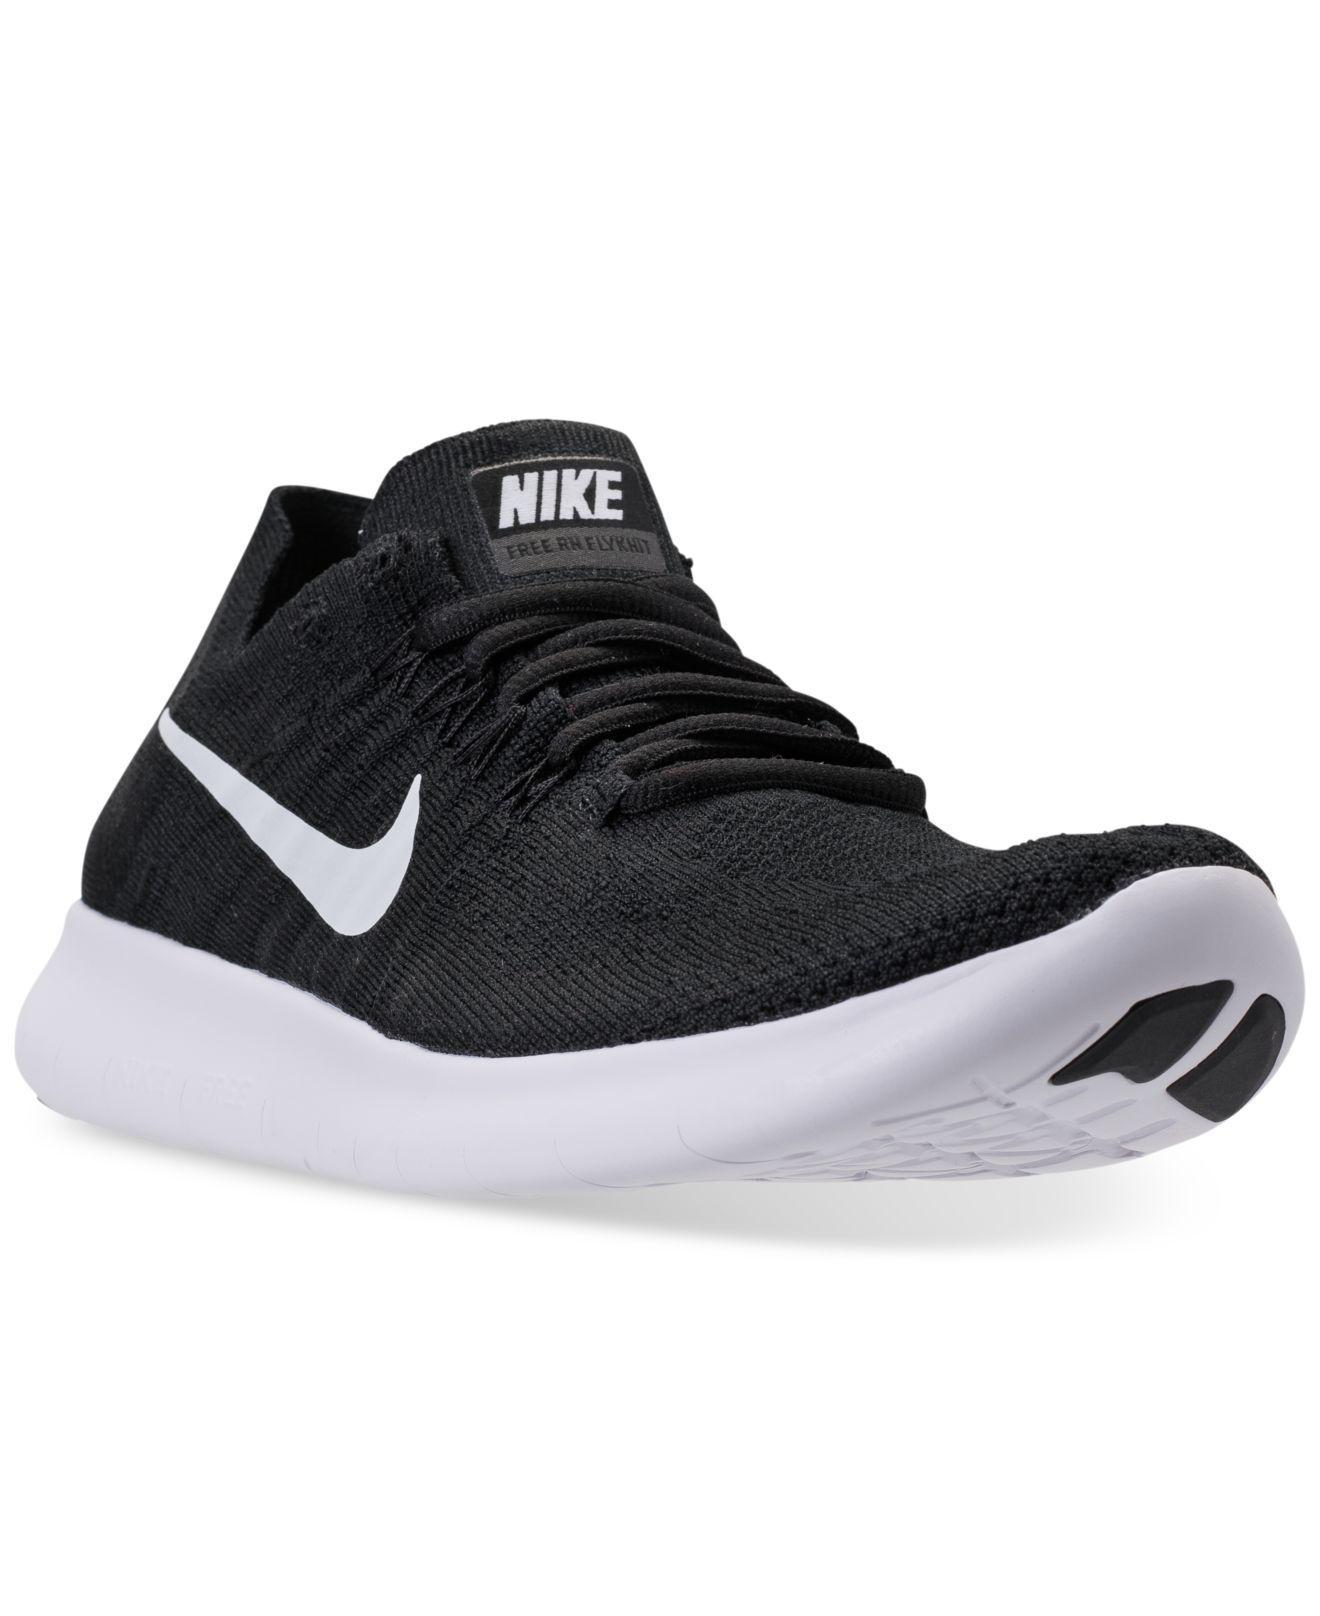 Nike. Black Women's Free Run Flyknit 2017 Running Sneakers From Finish Line